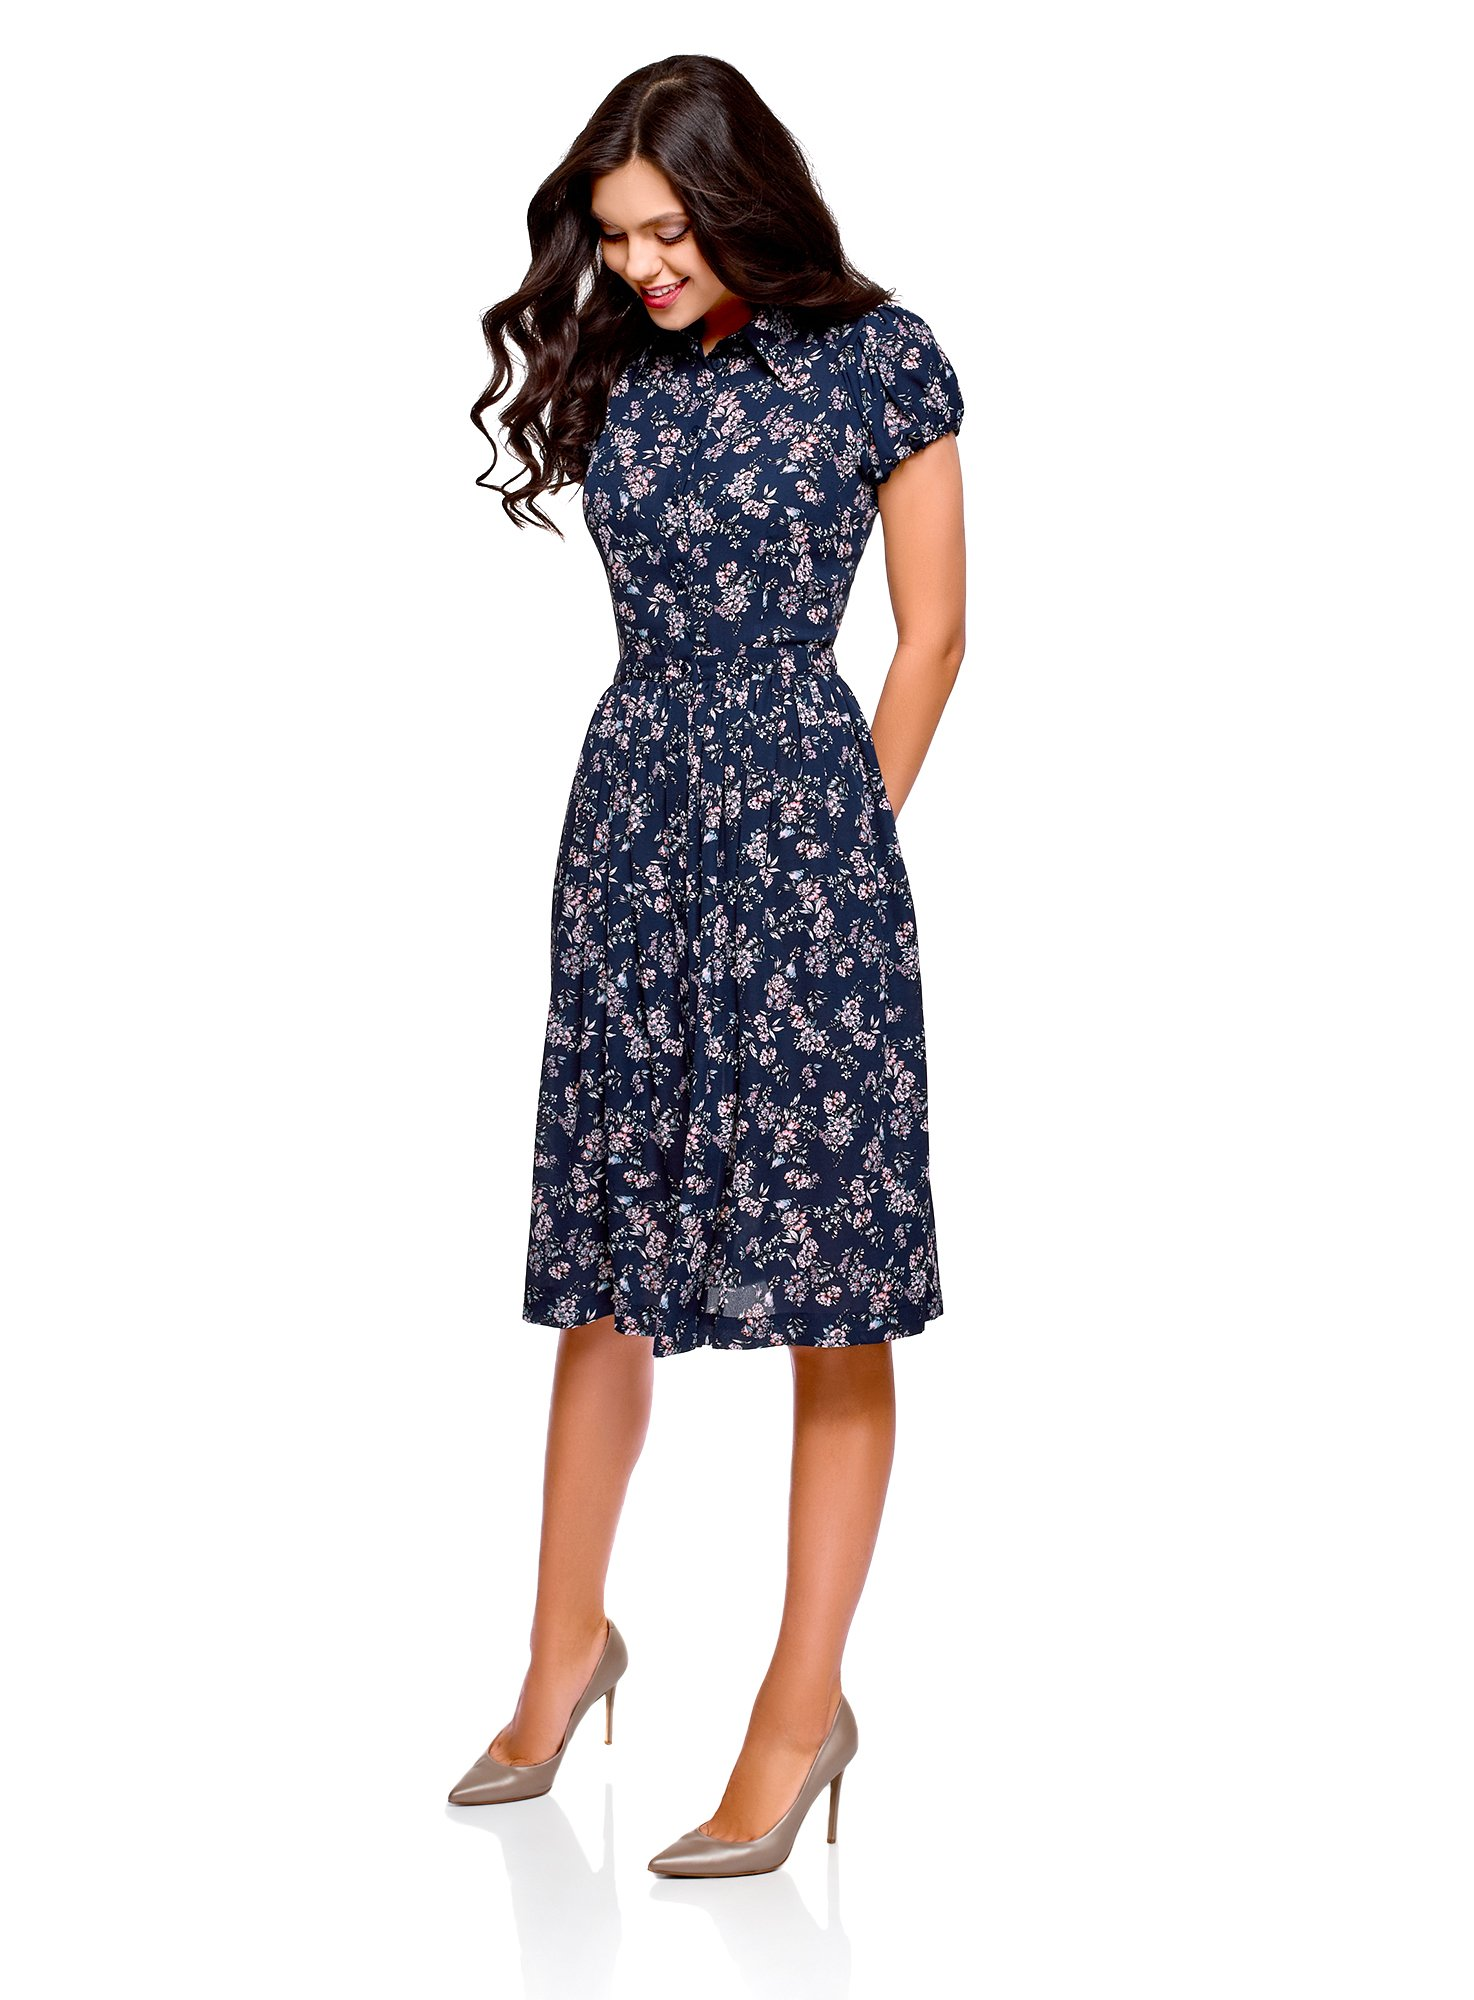 oodji Ultra Women's Midi Dress with Flared Skirt, Blue, US 4